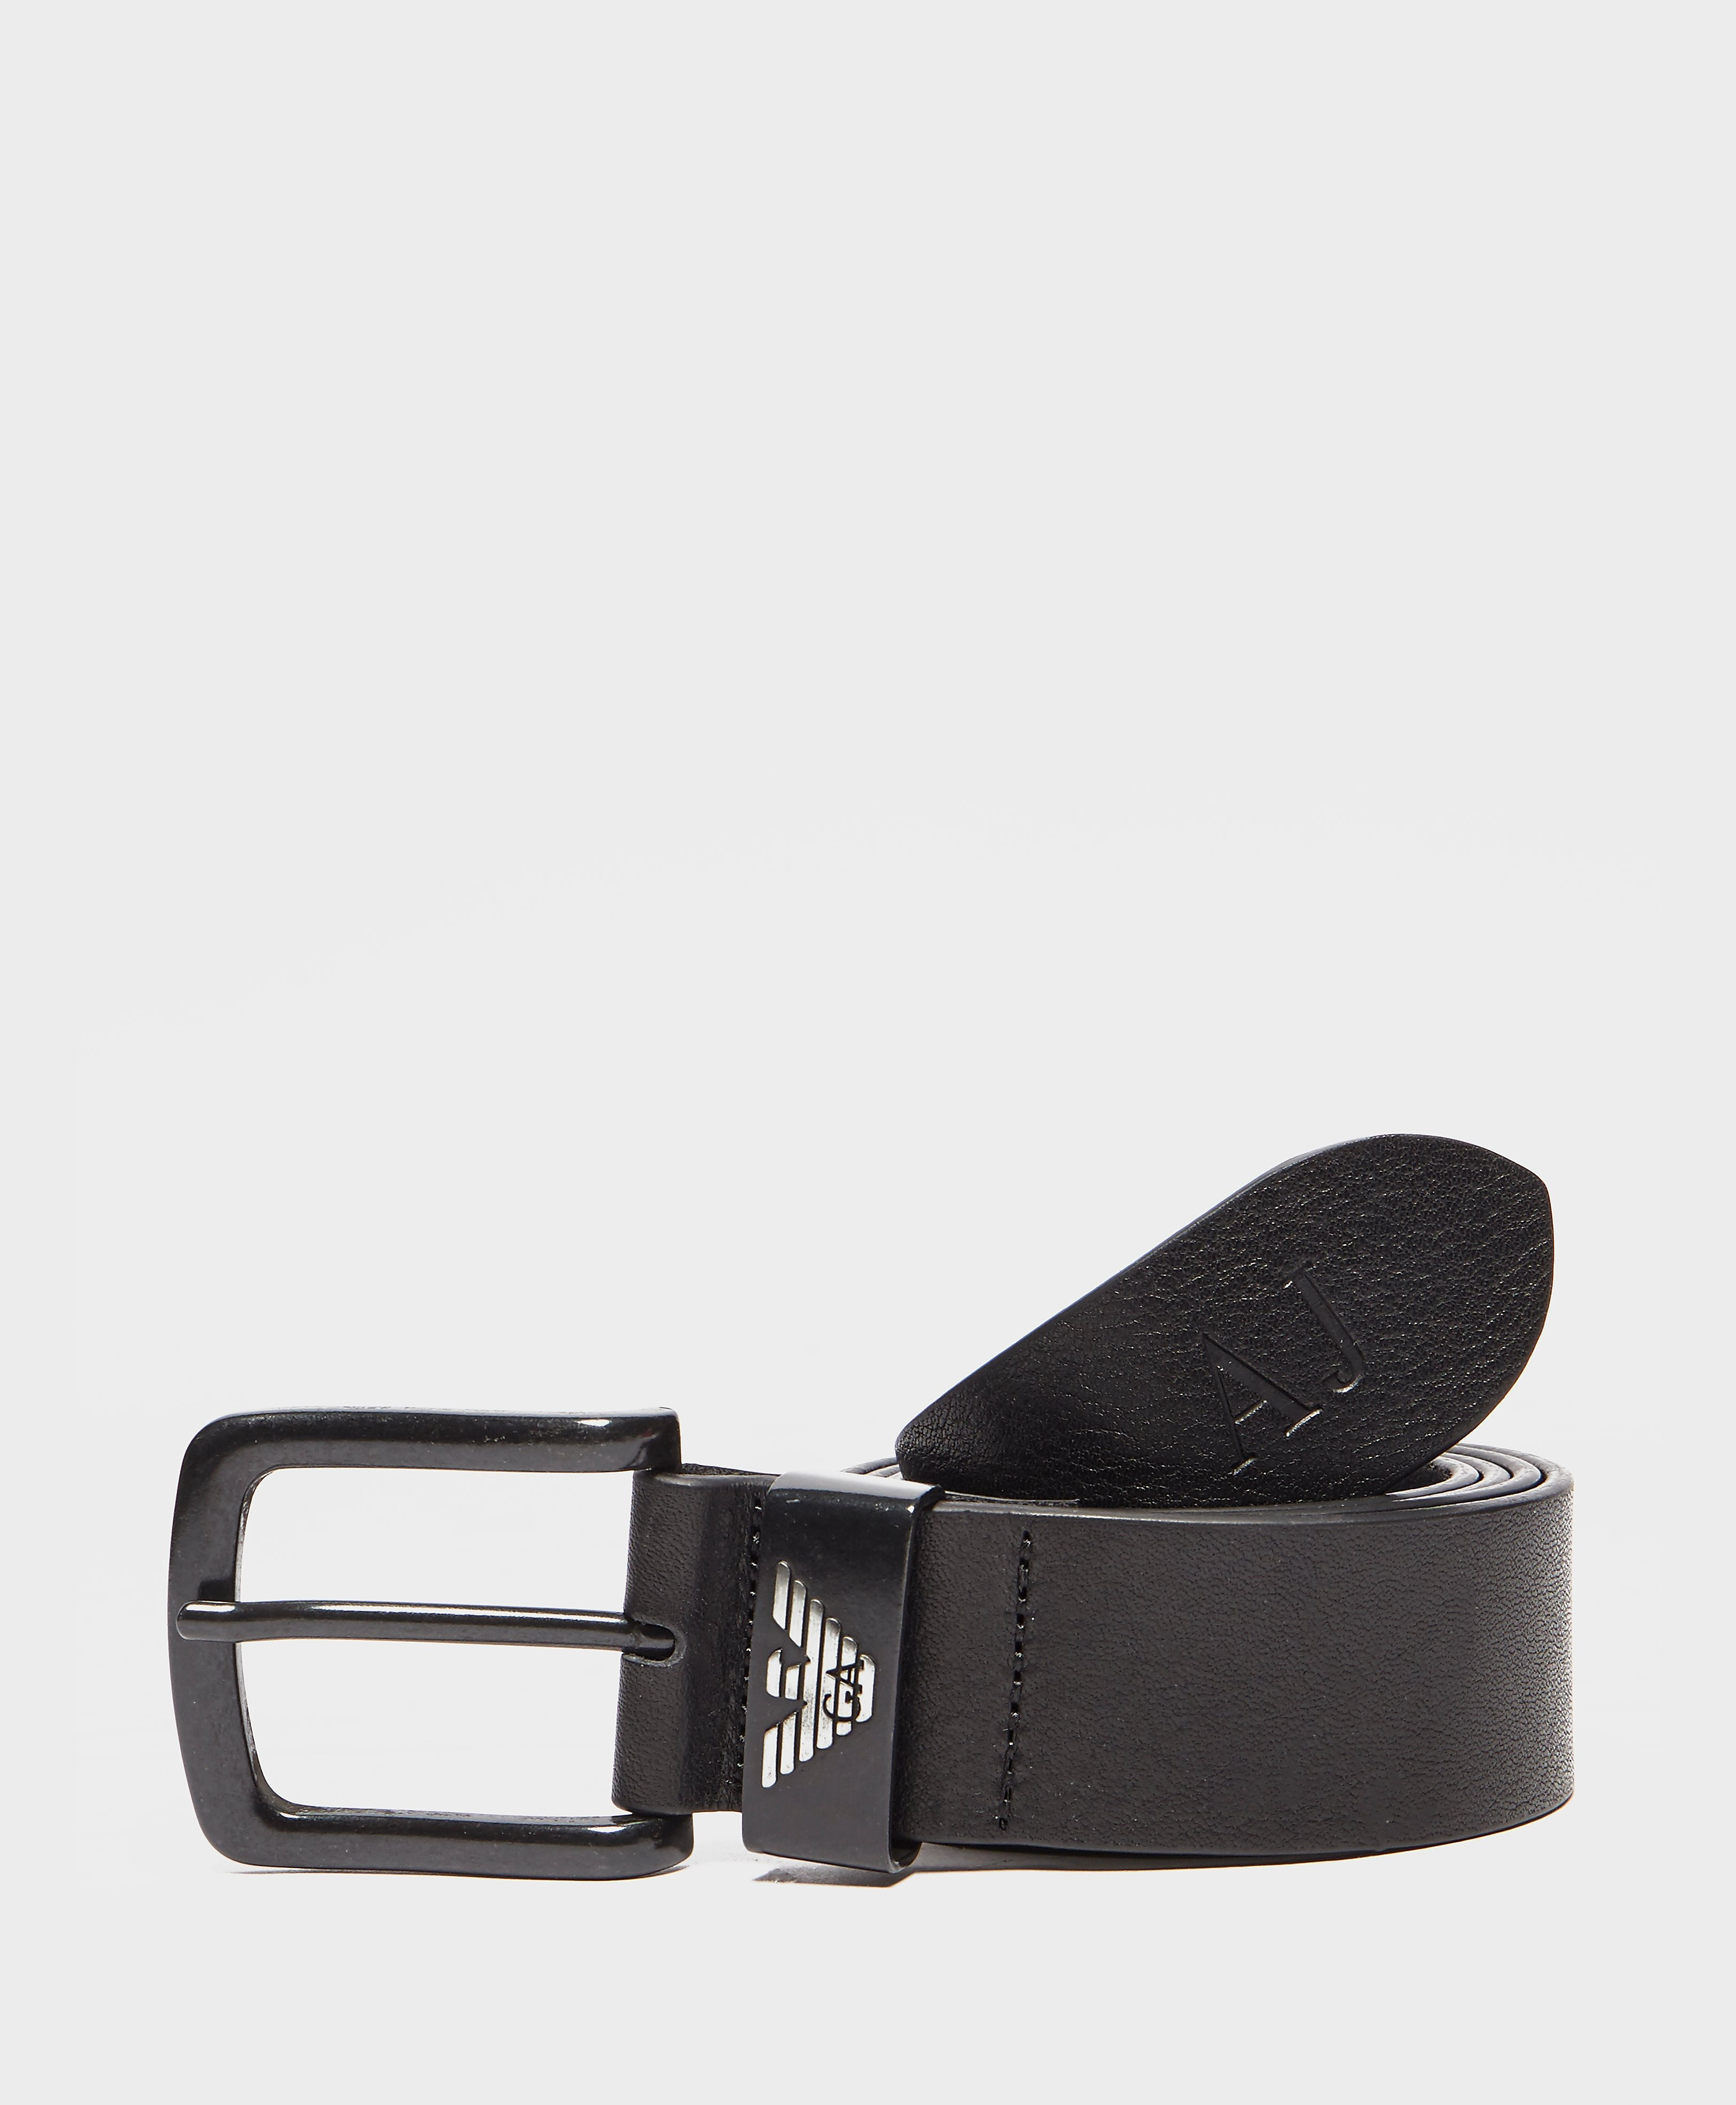 Armani Jeans Leather Belt Set